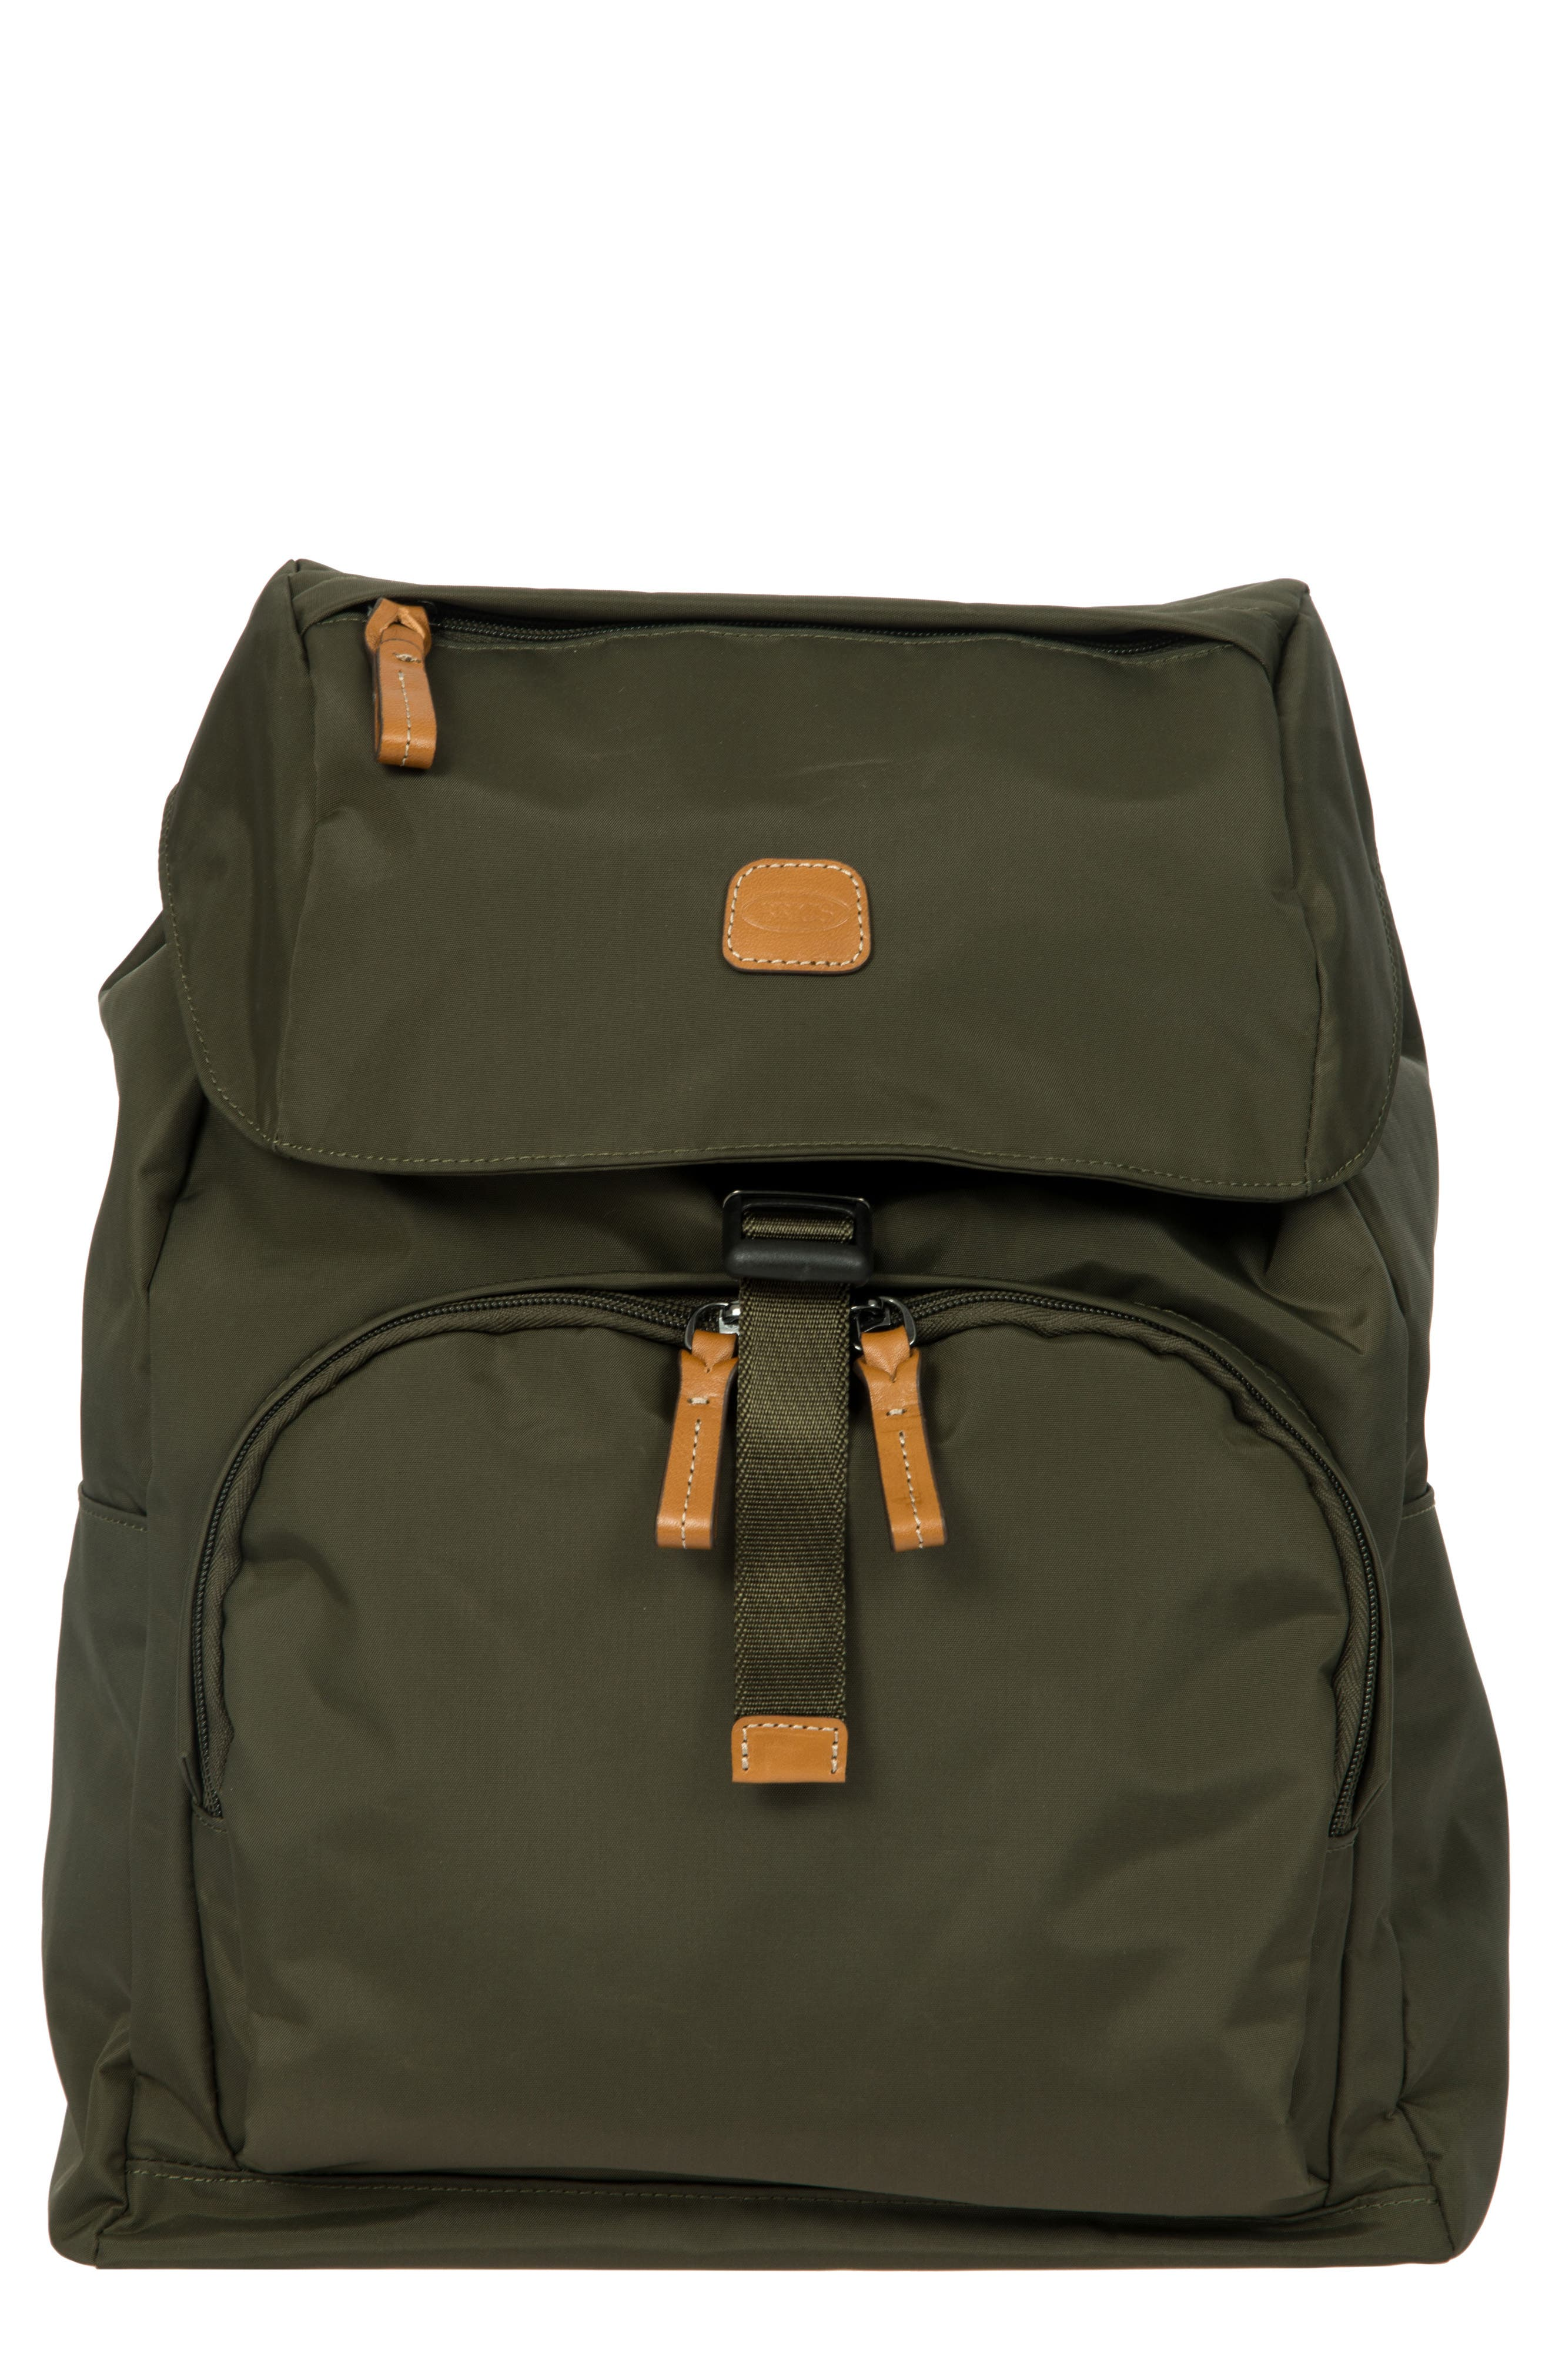 225b0909d567 Plastic Handbags   Wallets for Women